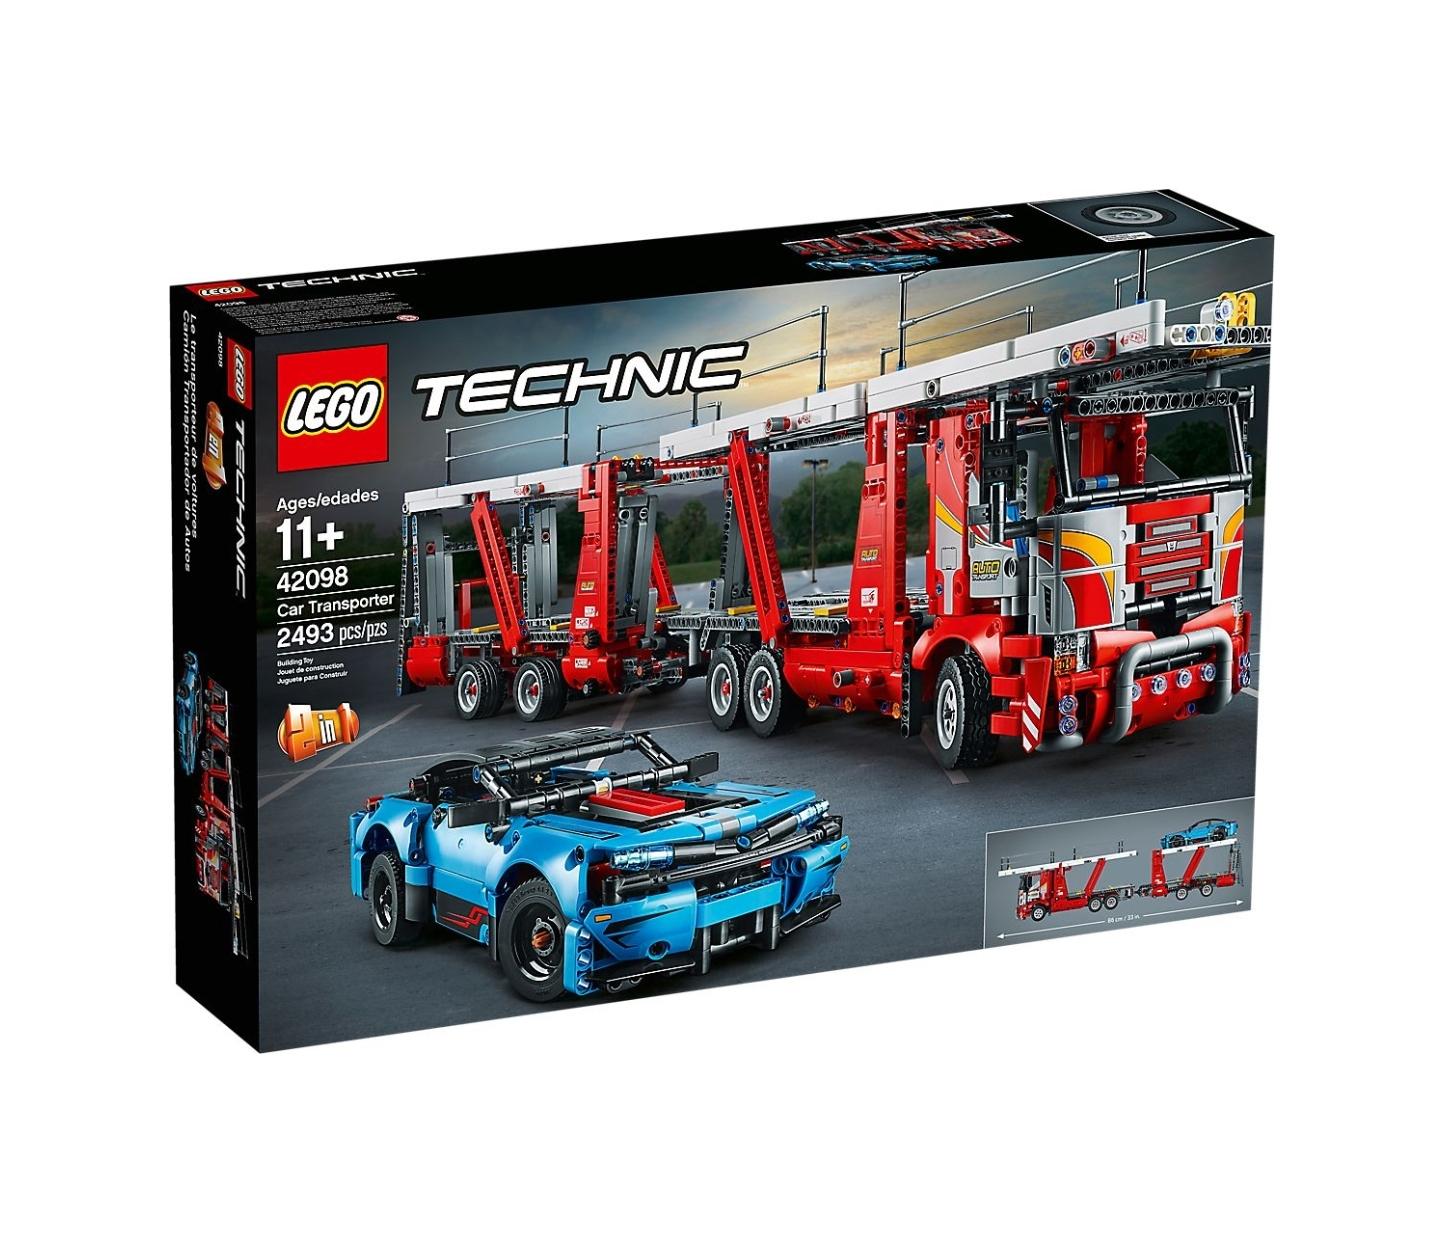 Lego Technic: Car Transporter 42098